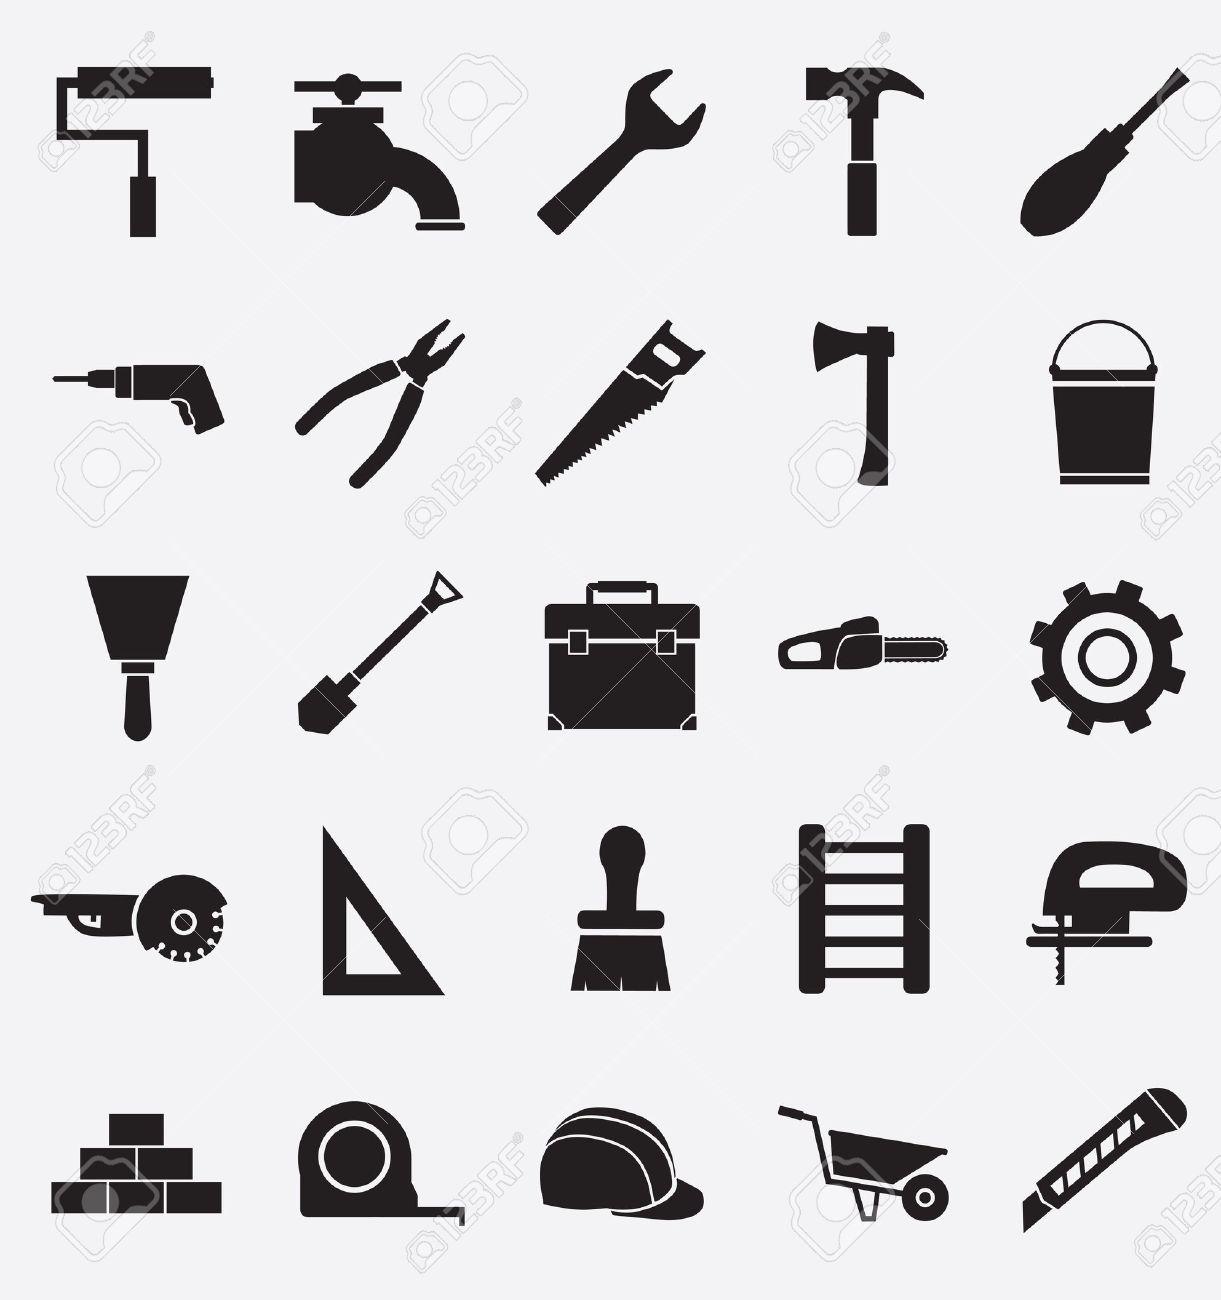 Hand Tools - Set Of Icons. Isolated Black Symbols On White ...